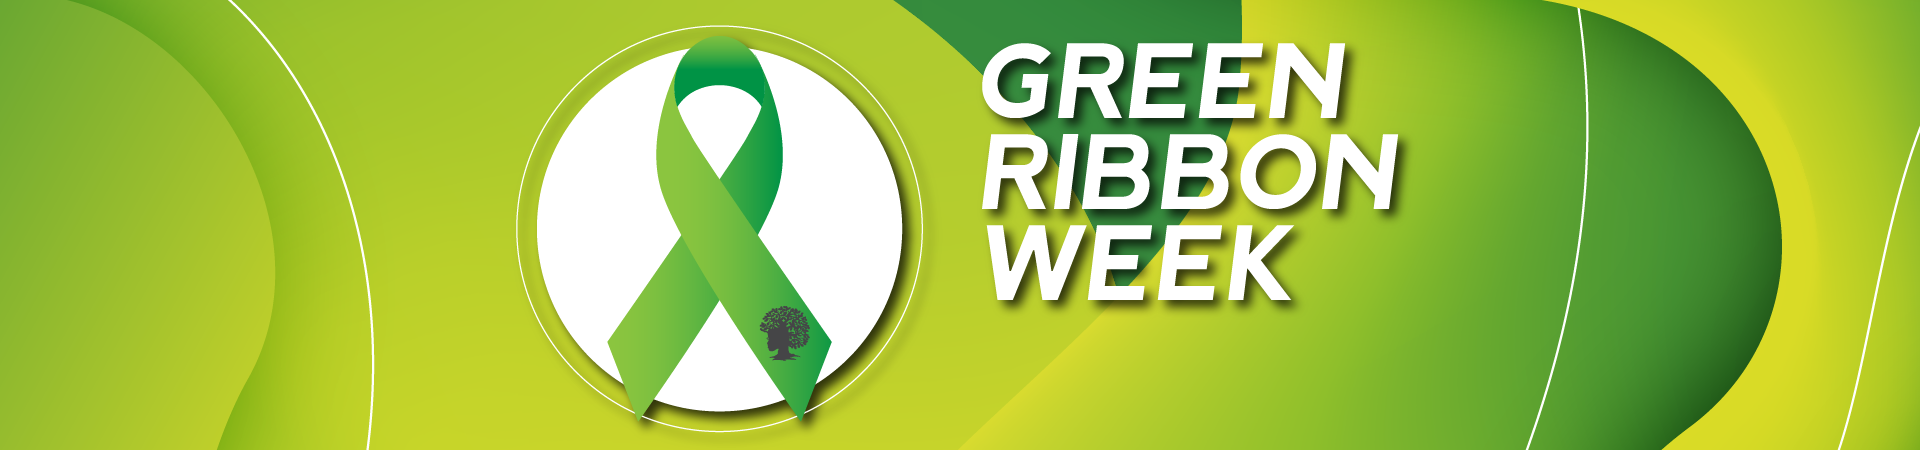 Green Ribbon Week